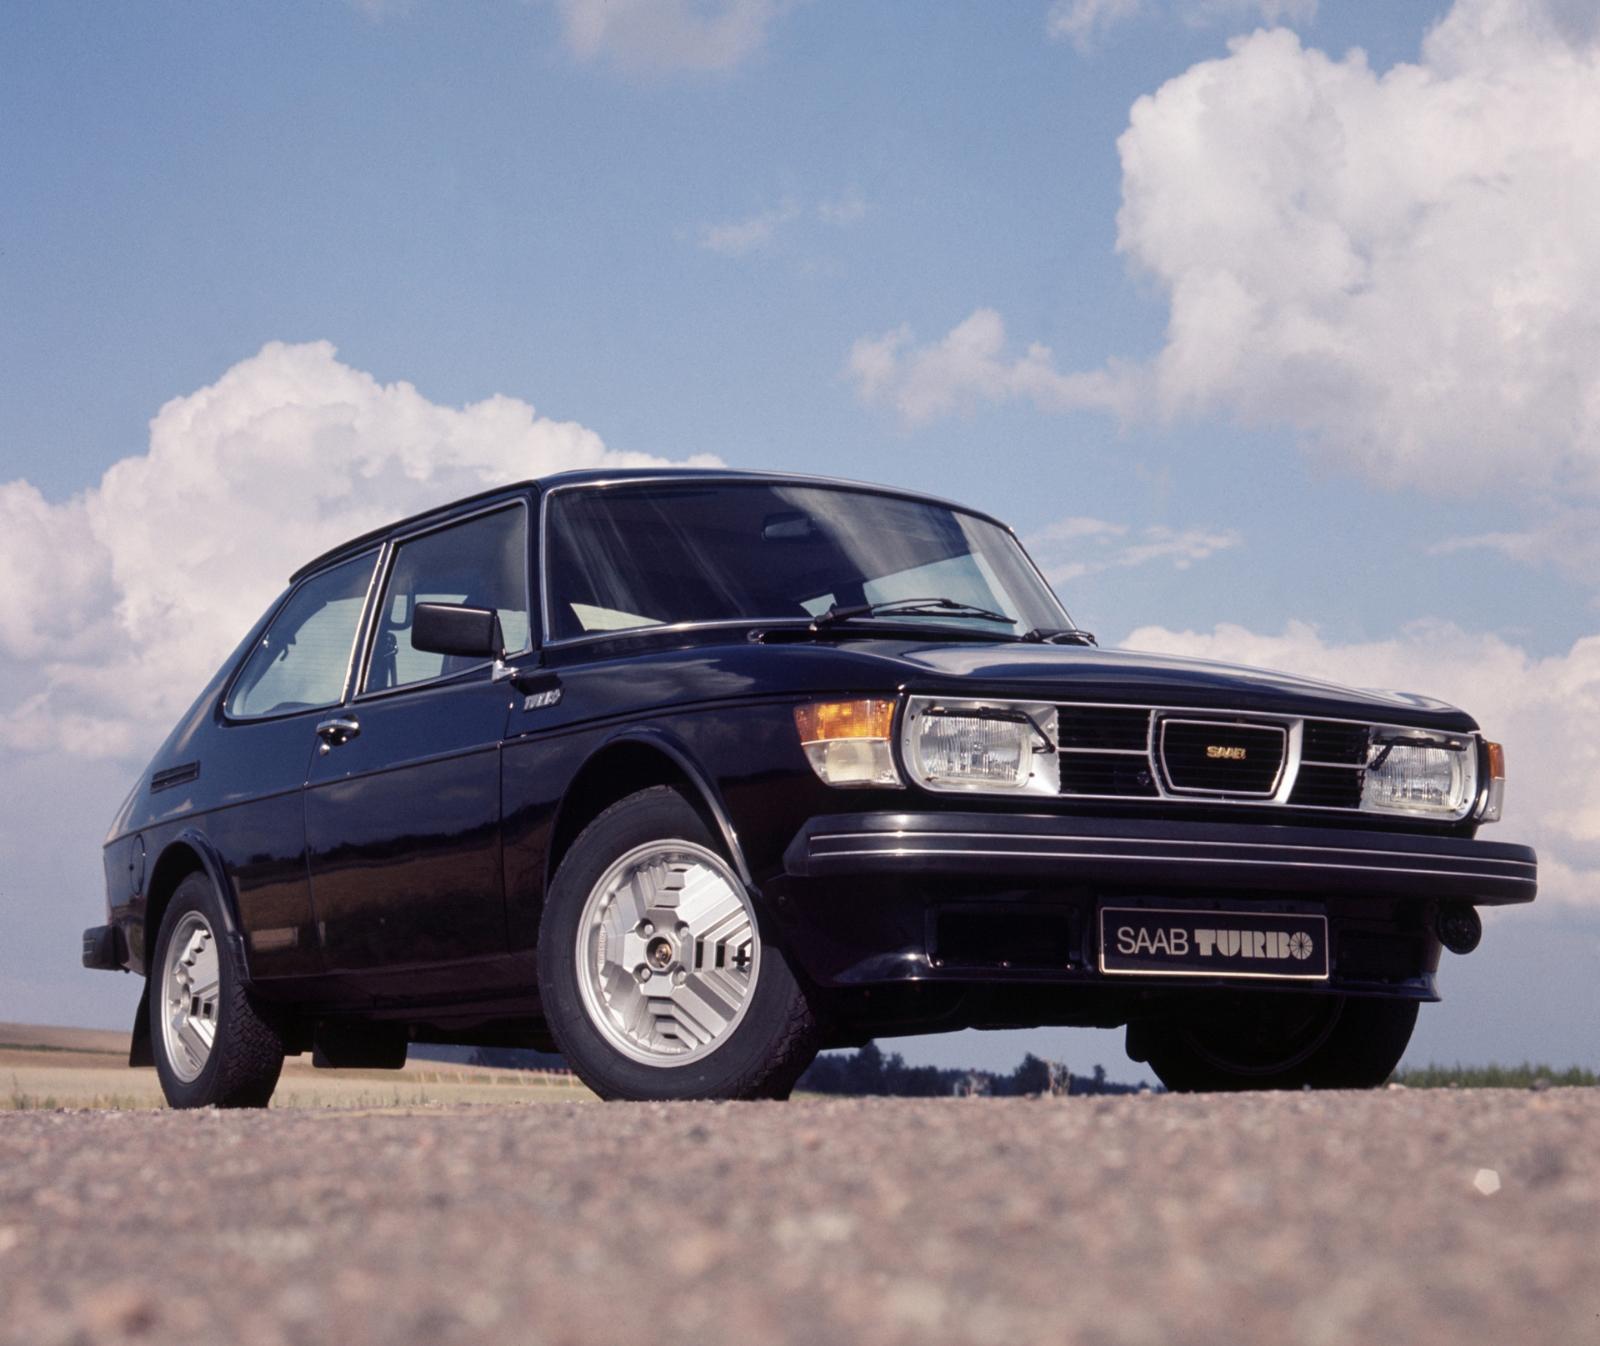 Front 20Seat 82408542 in addition Dashboard 59176594 likewise Saab Szwedzkie Auta O Ktorych Warto Pamietac Galeria furthermore Exterior 49786280 besides Exterior 47641735. on saab 9 3 2004 convertible